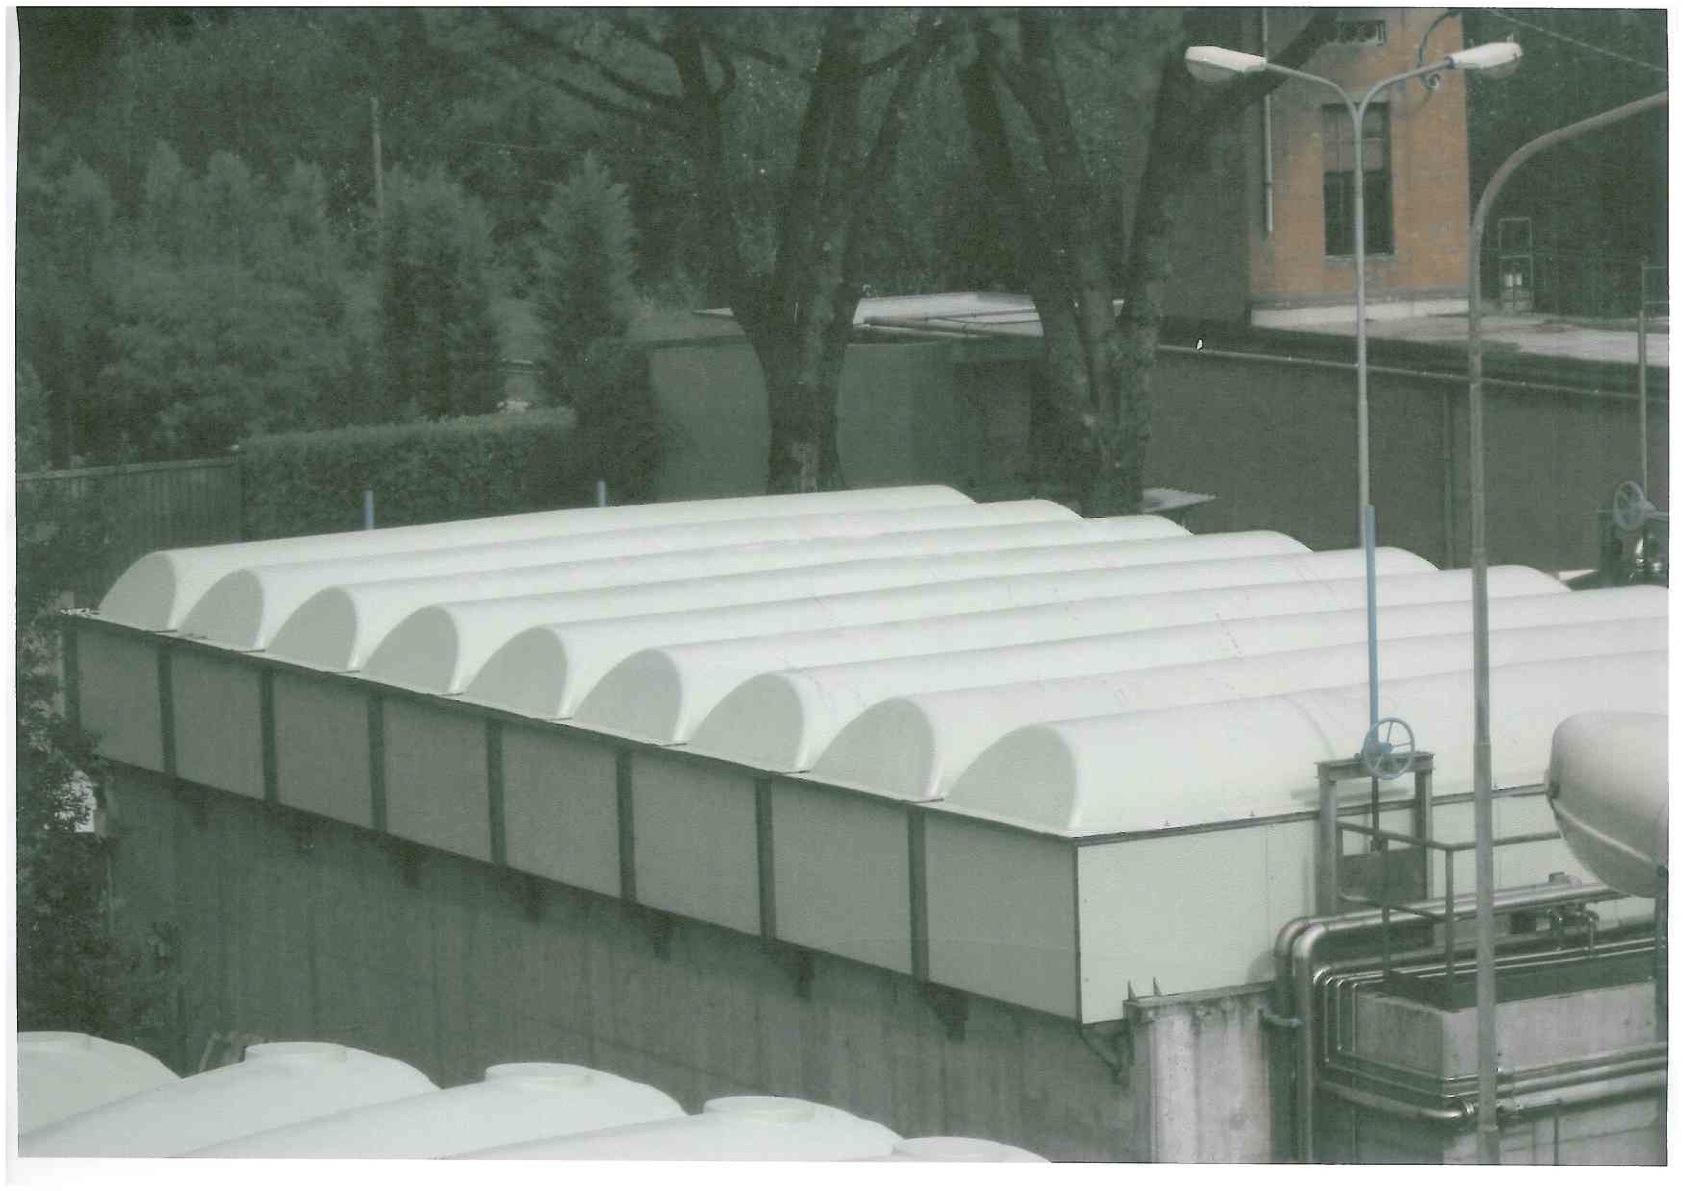 Copertura in vetroresina per le vasche del depuratore di for Vasche per laghetti in vetroresina